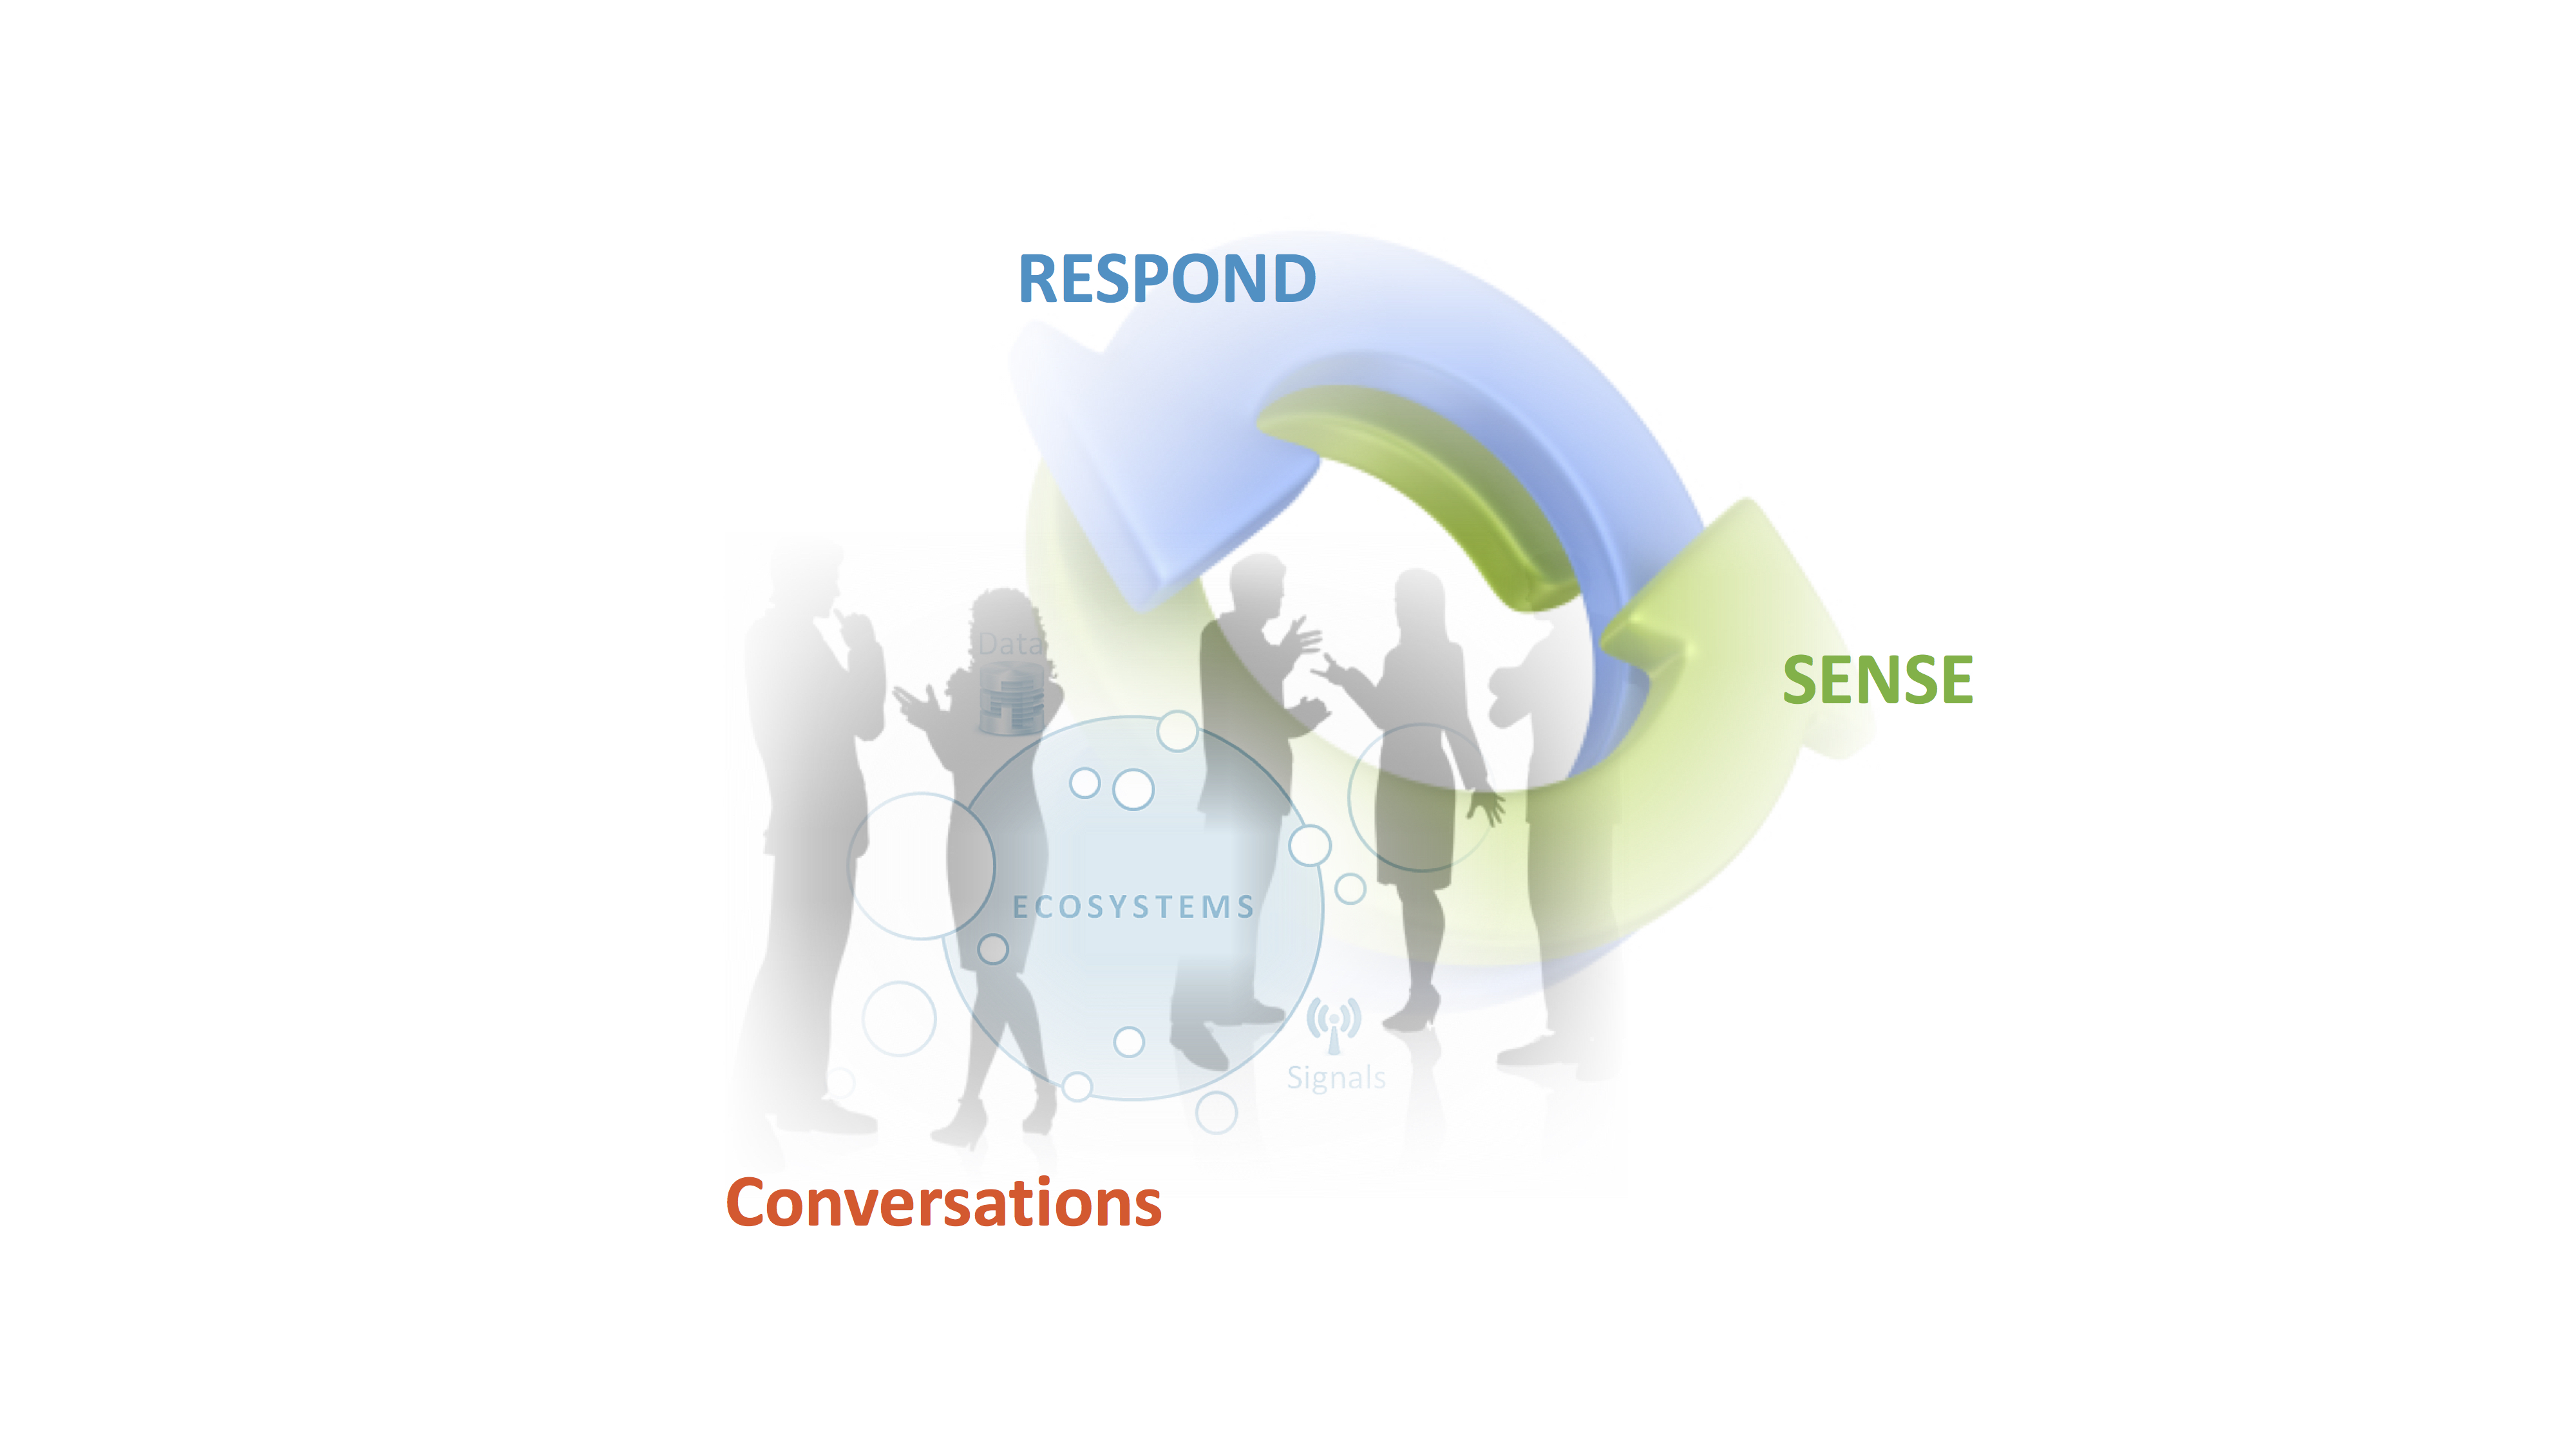 ssense-and-respond-visual